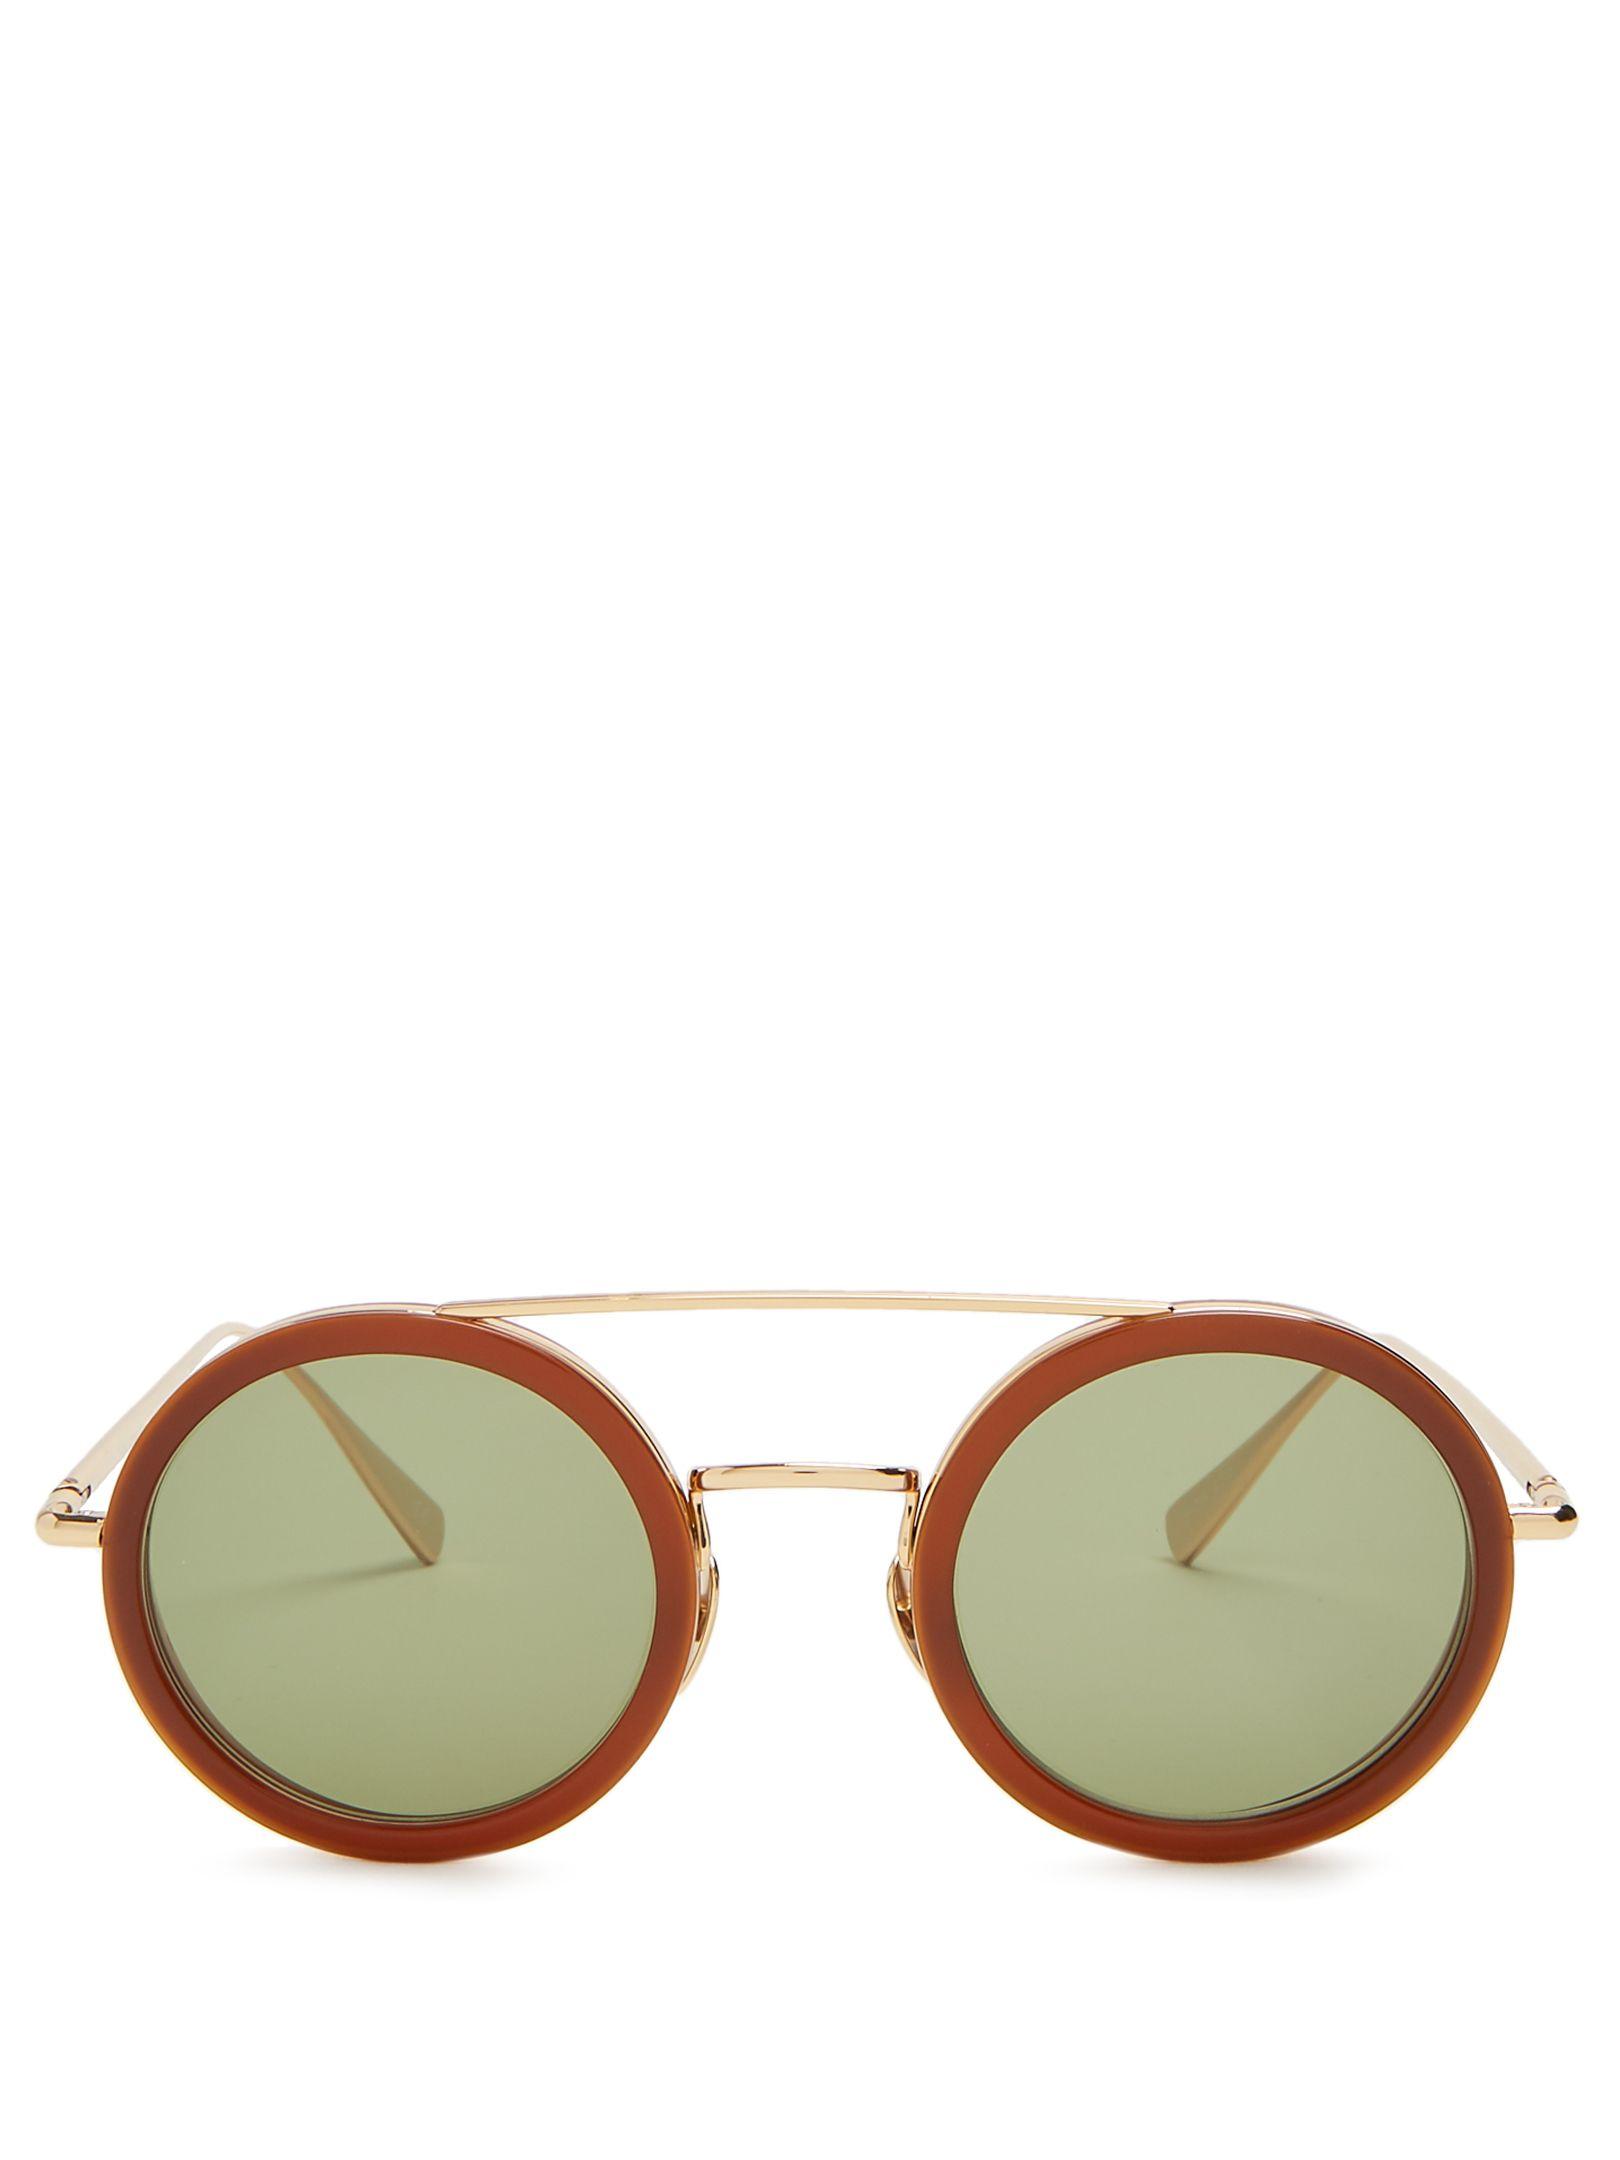 Kowalski Round-Frame Sunglasses, Brown Gold | Brille | Pinterest ...